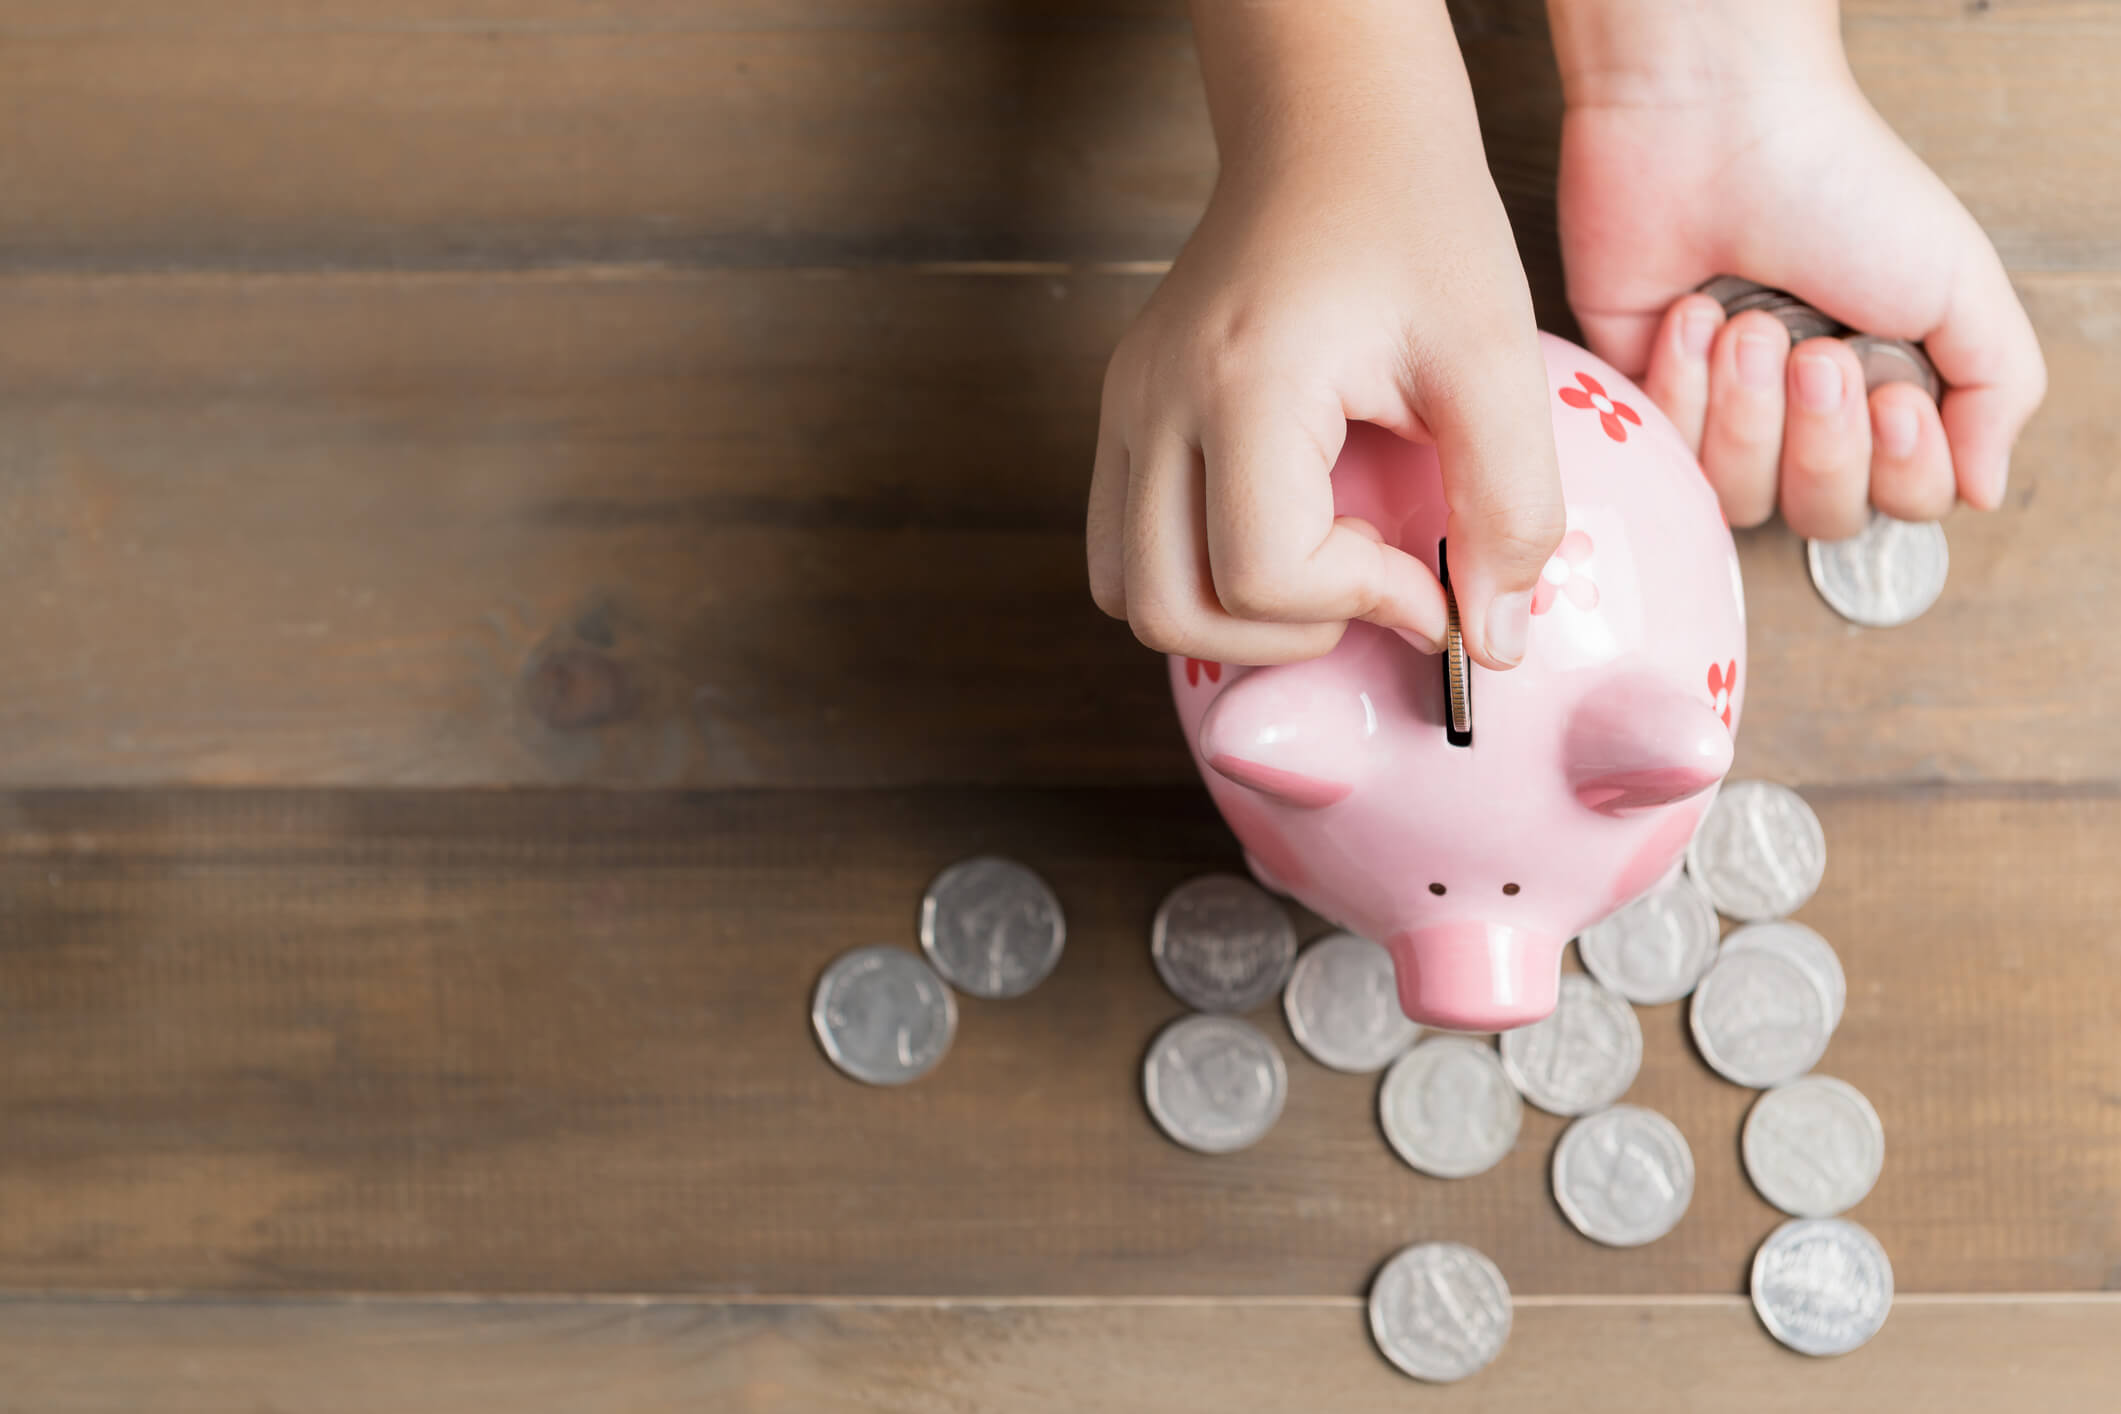 A person saving money